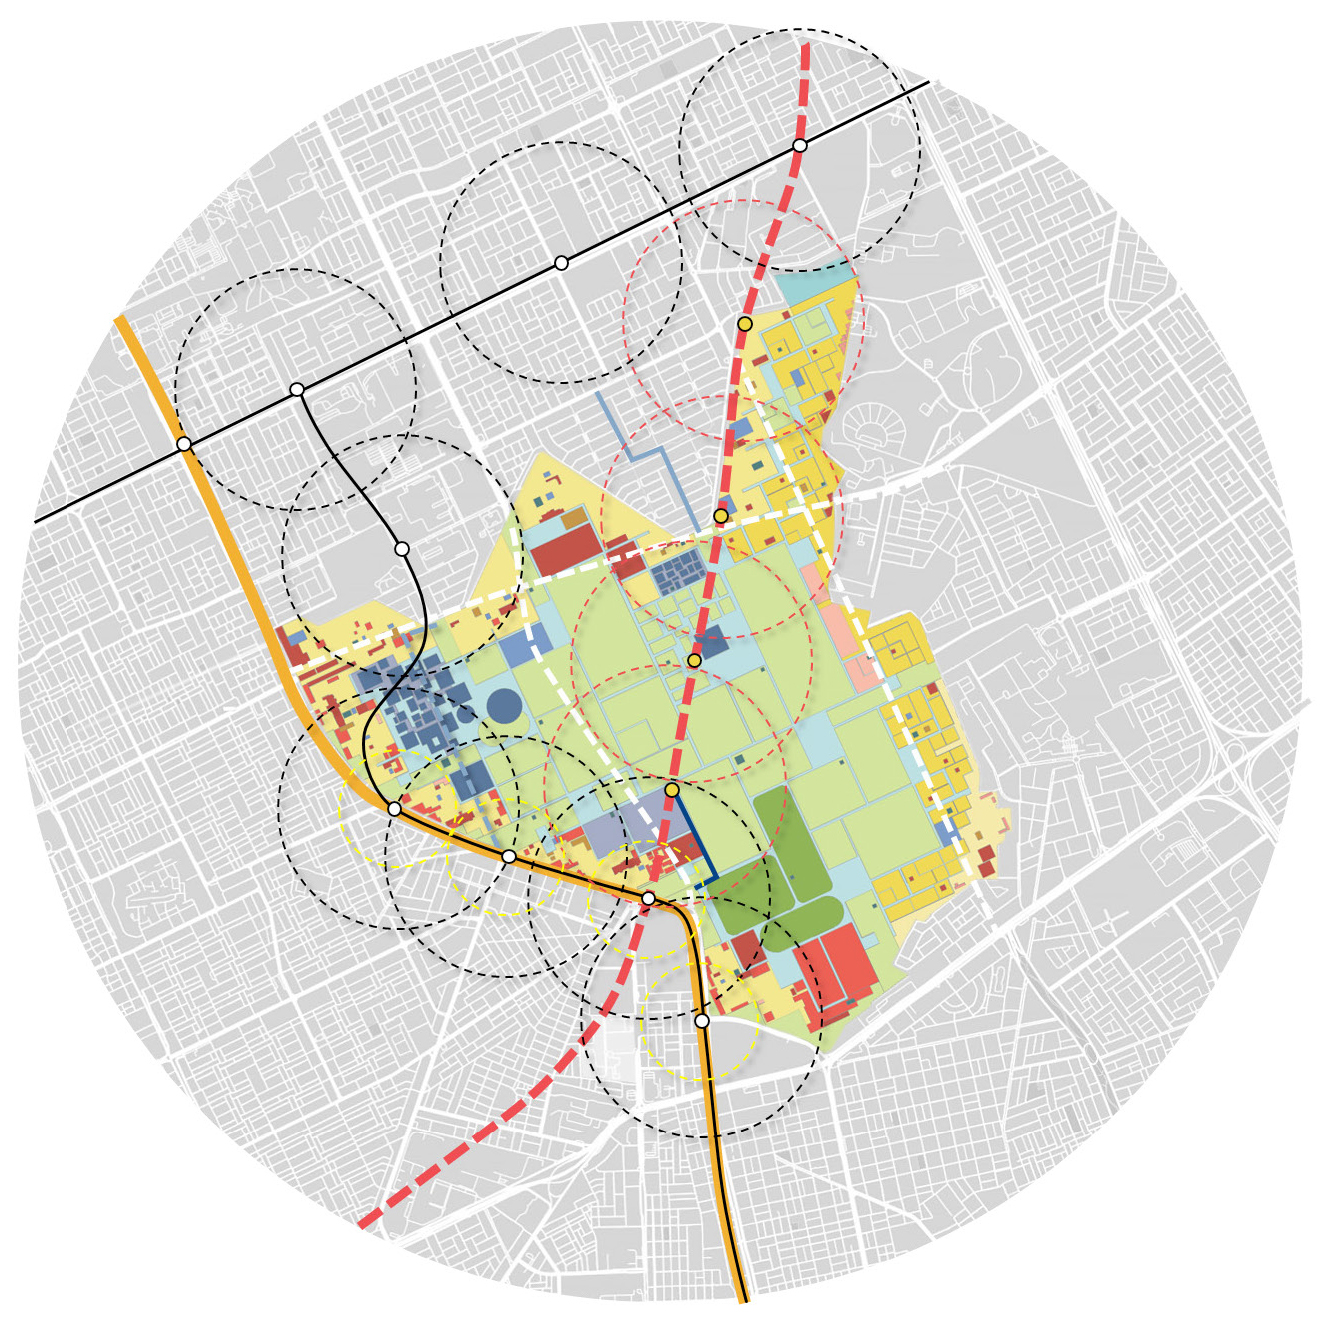 King Salman Park Transit Oriented Development